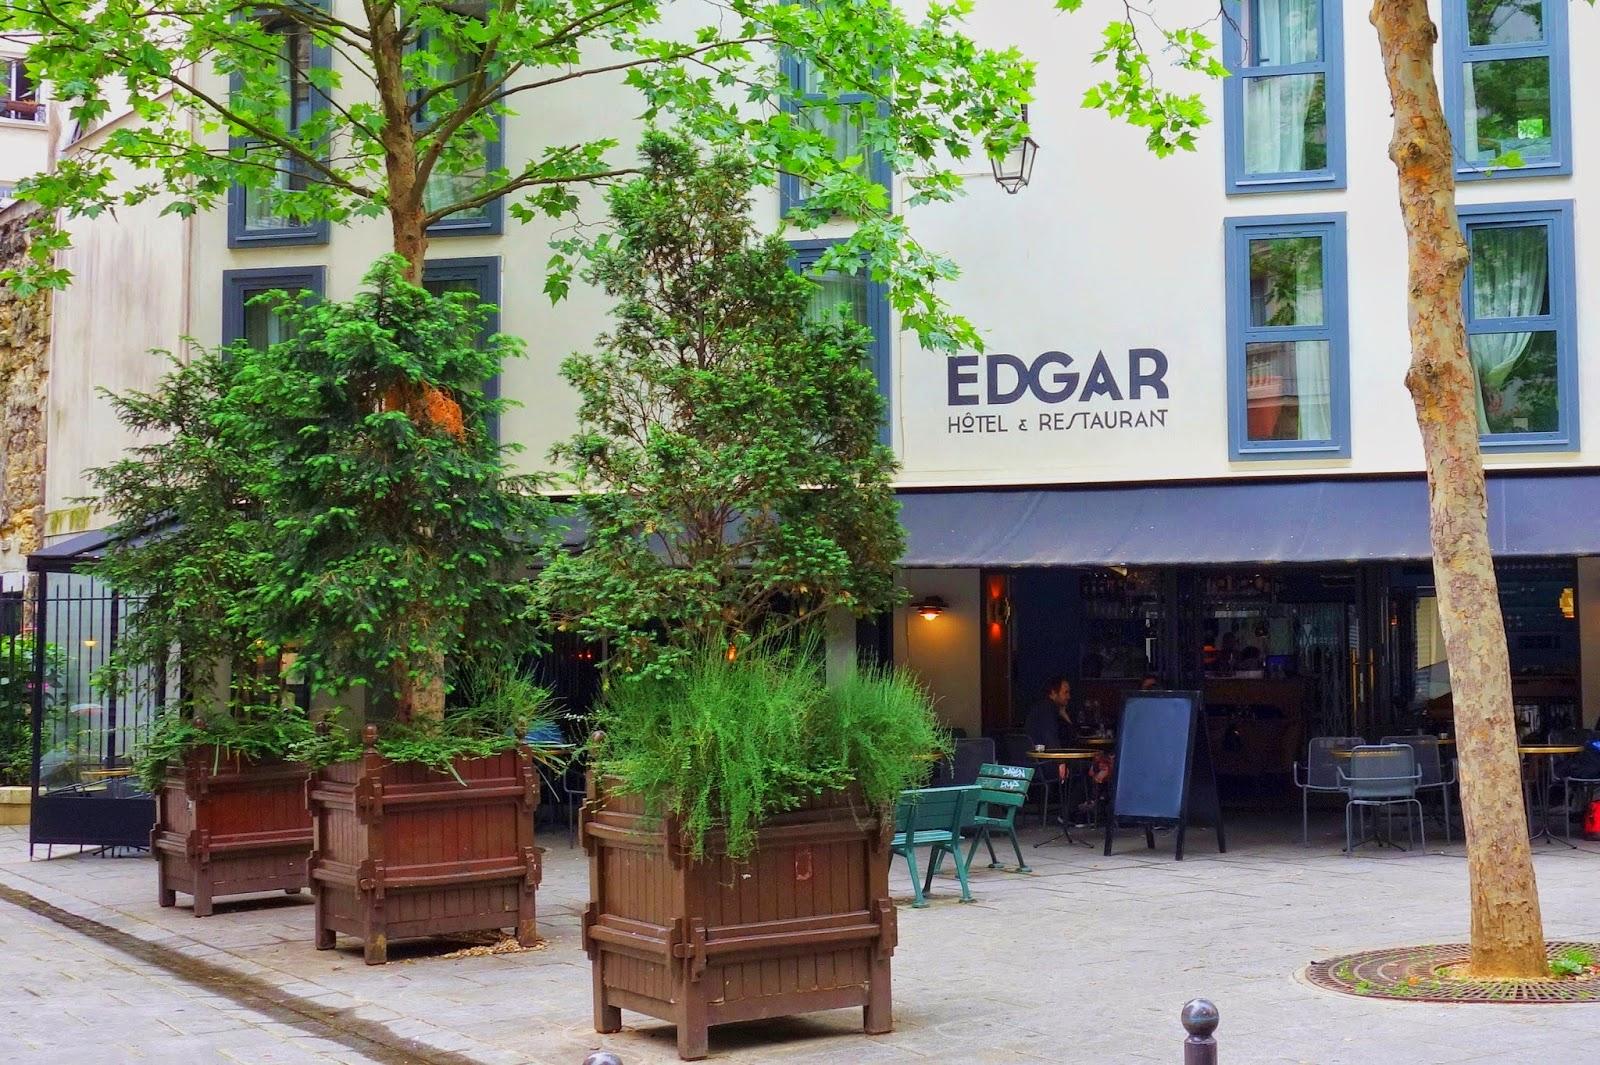 Hotel Edgar Quinet Edgar Hotel Paris Latest Photos With Edgar Hotel Paris Finest